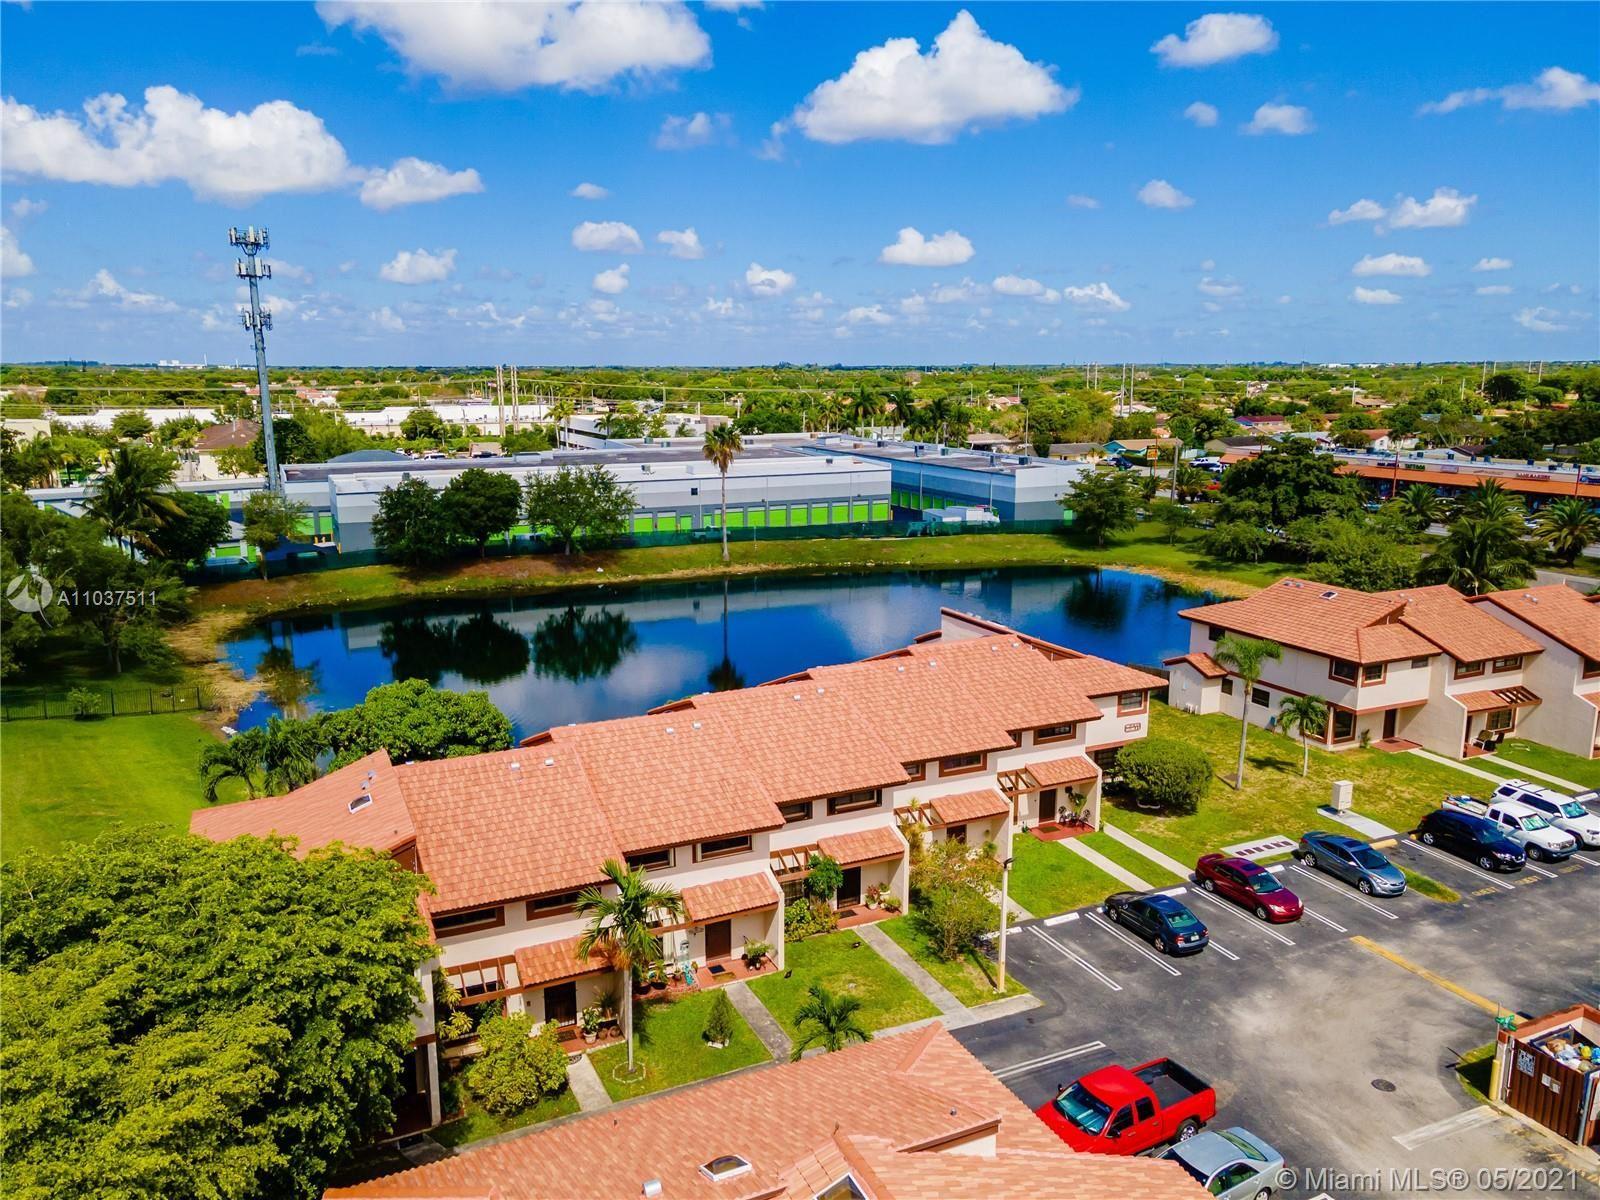 5810 SW 133rd Pl #6-2, Miami, FL 33183 - #: A11037511